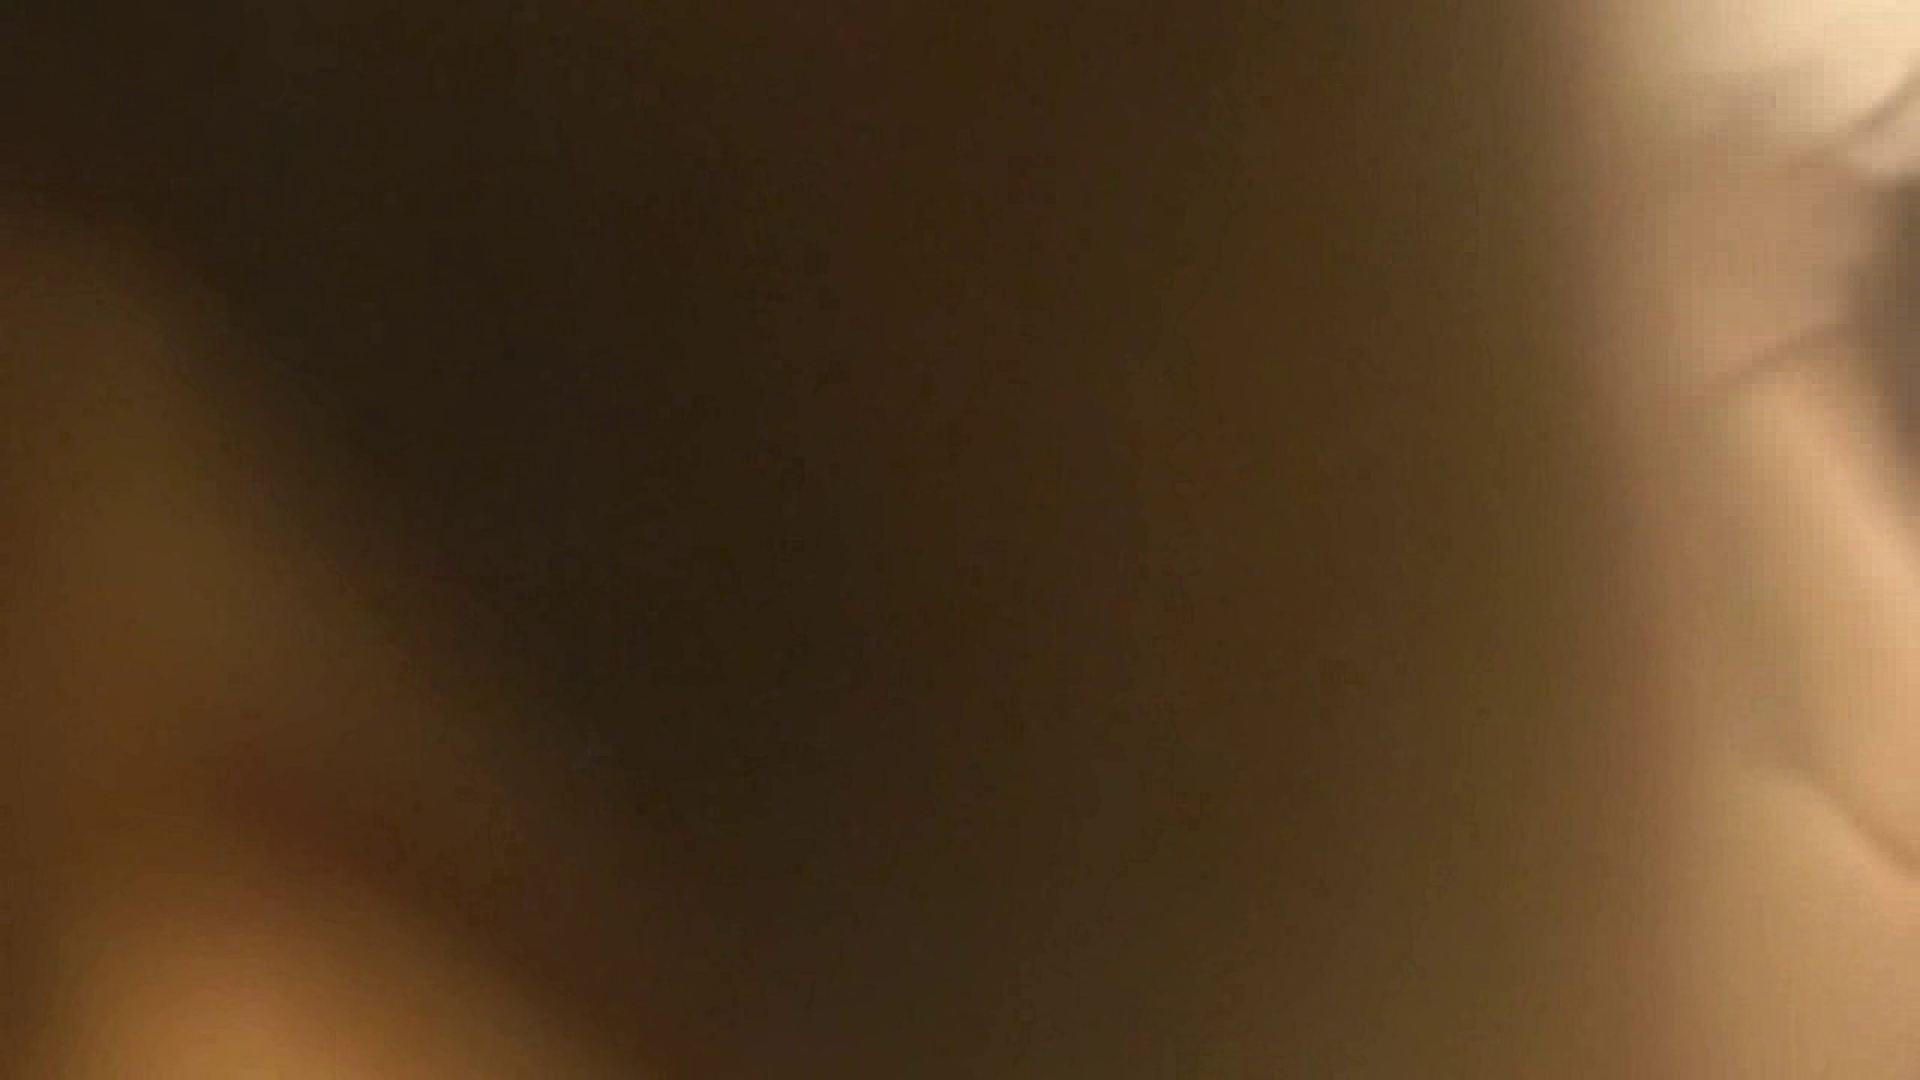 vol.1 Mayumi 窓越しに入浴シーン撮影に成功 入浴中の女性  57PIX 22